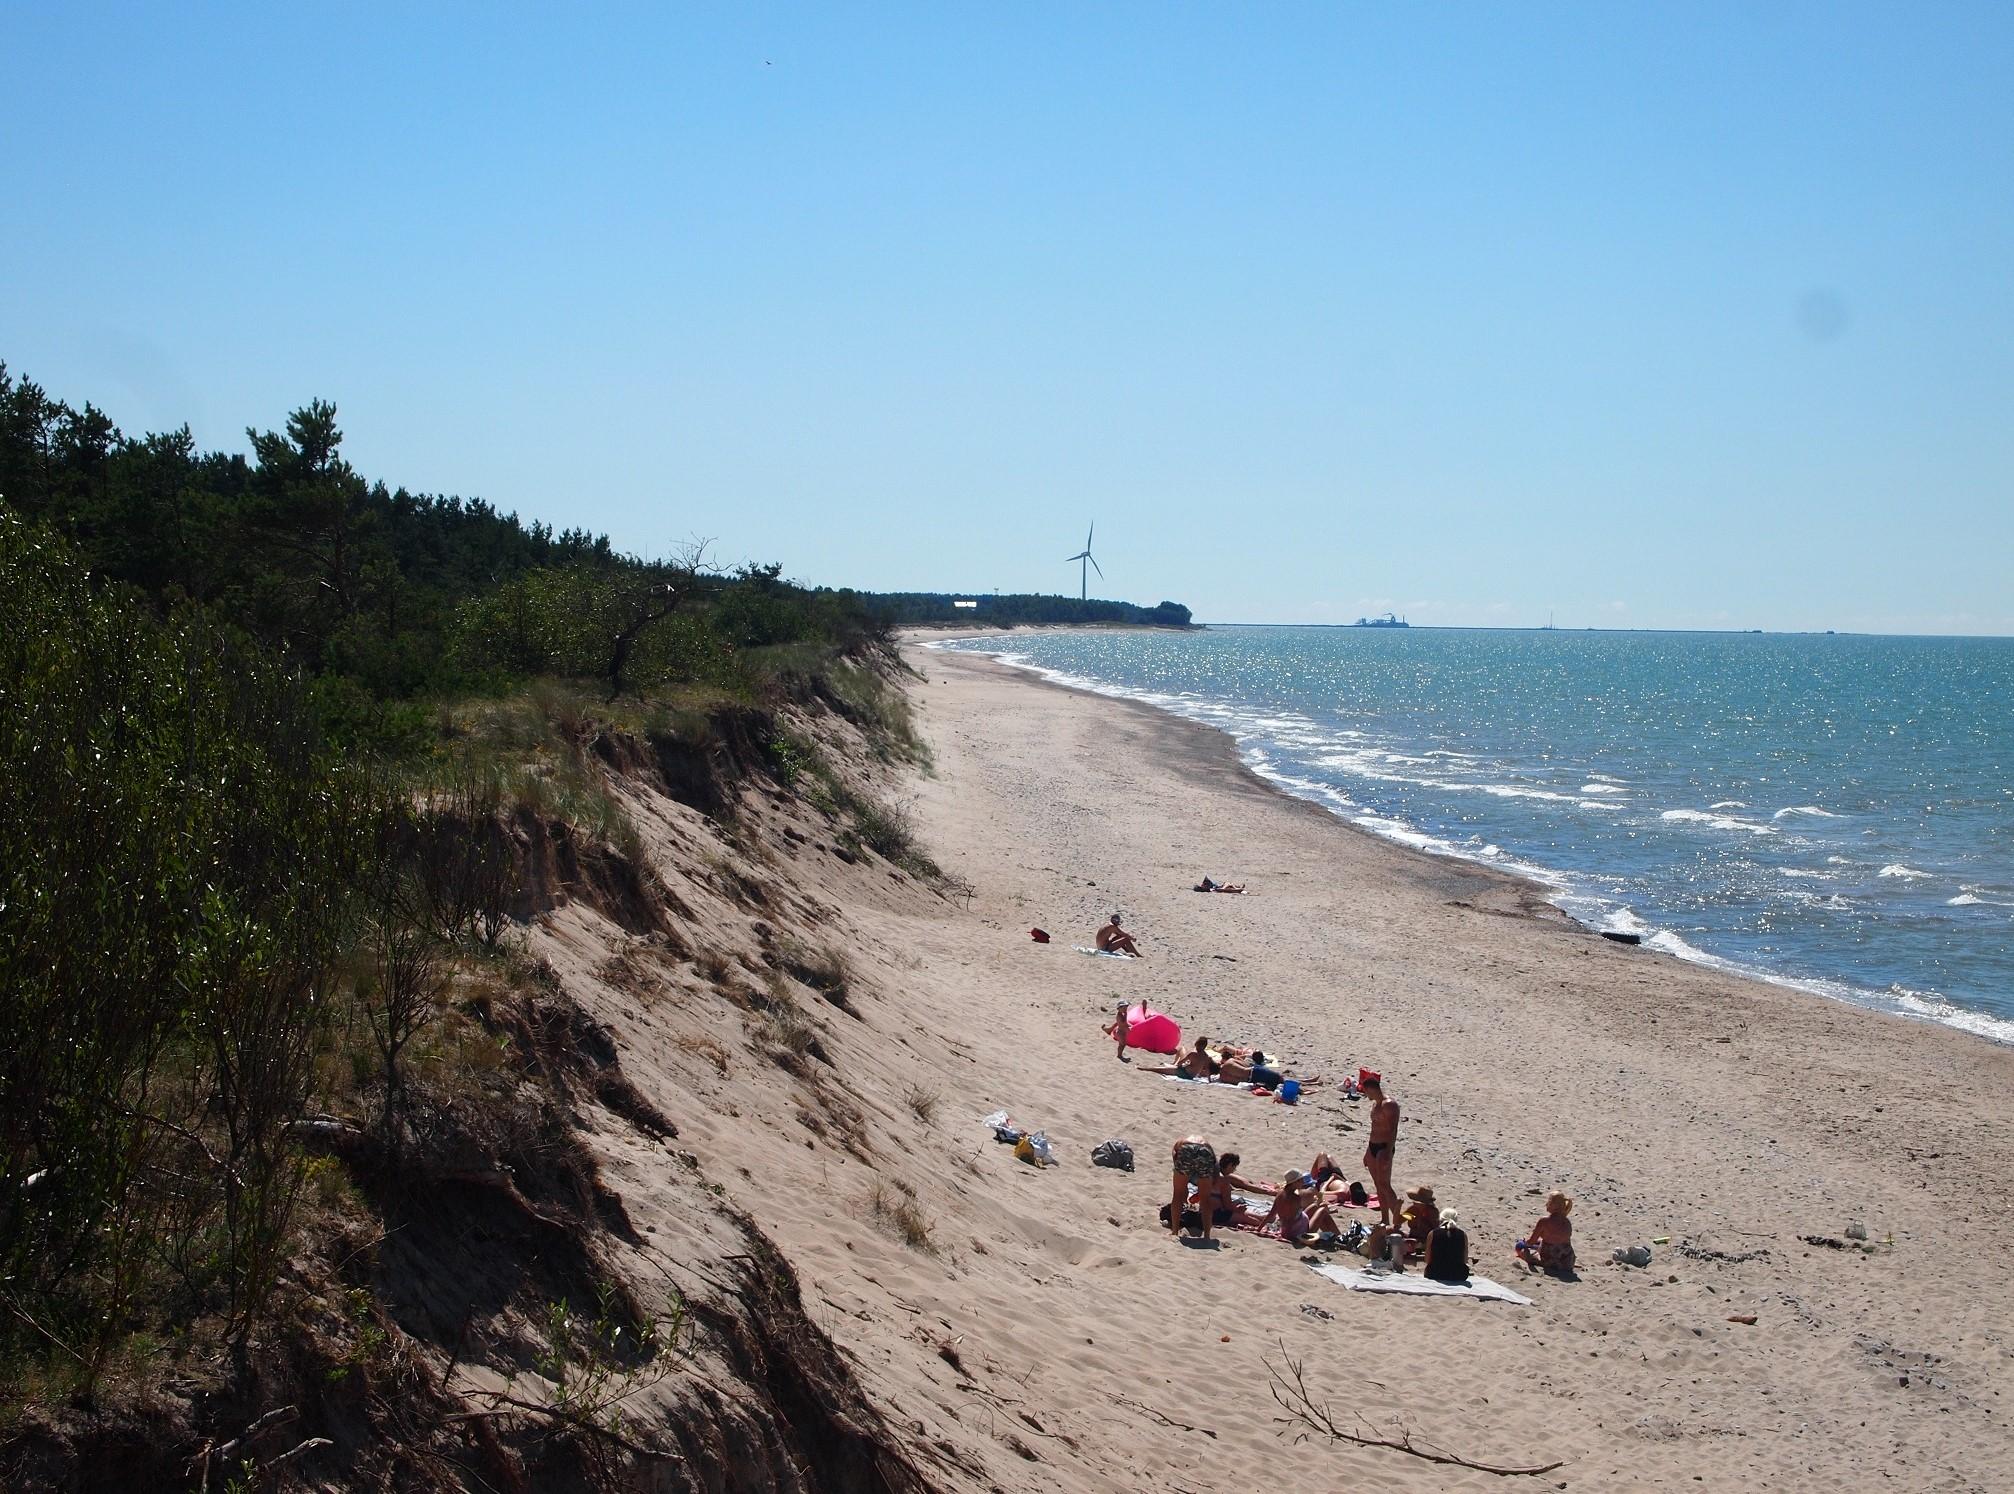 Beach at Southwestern Kurzeme coast near Liepaja